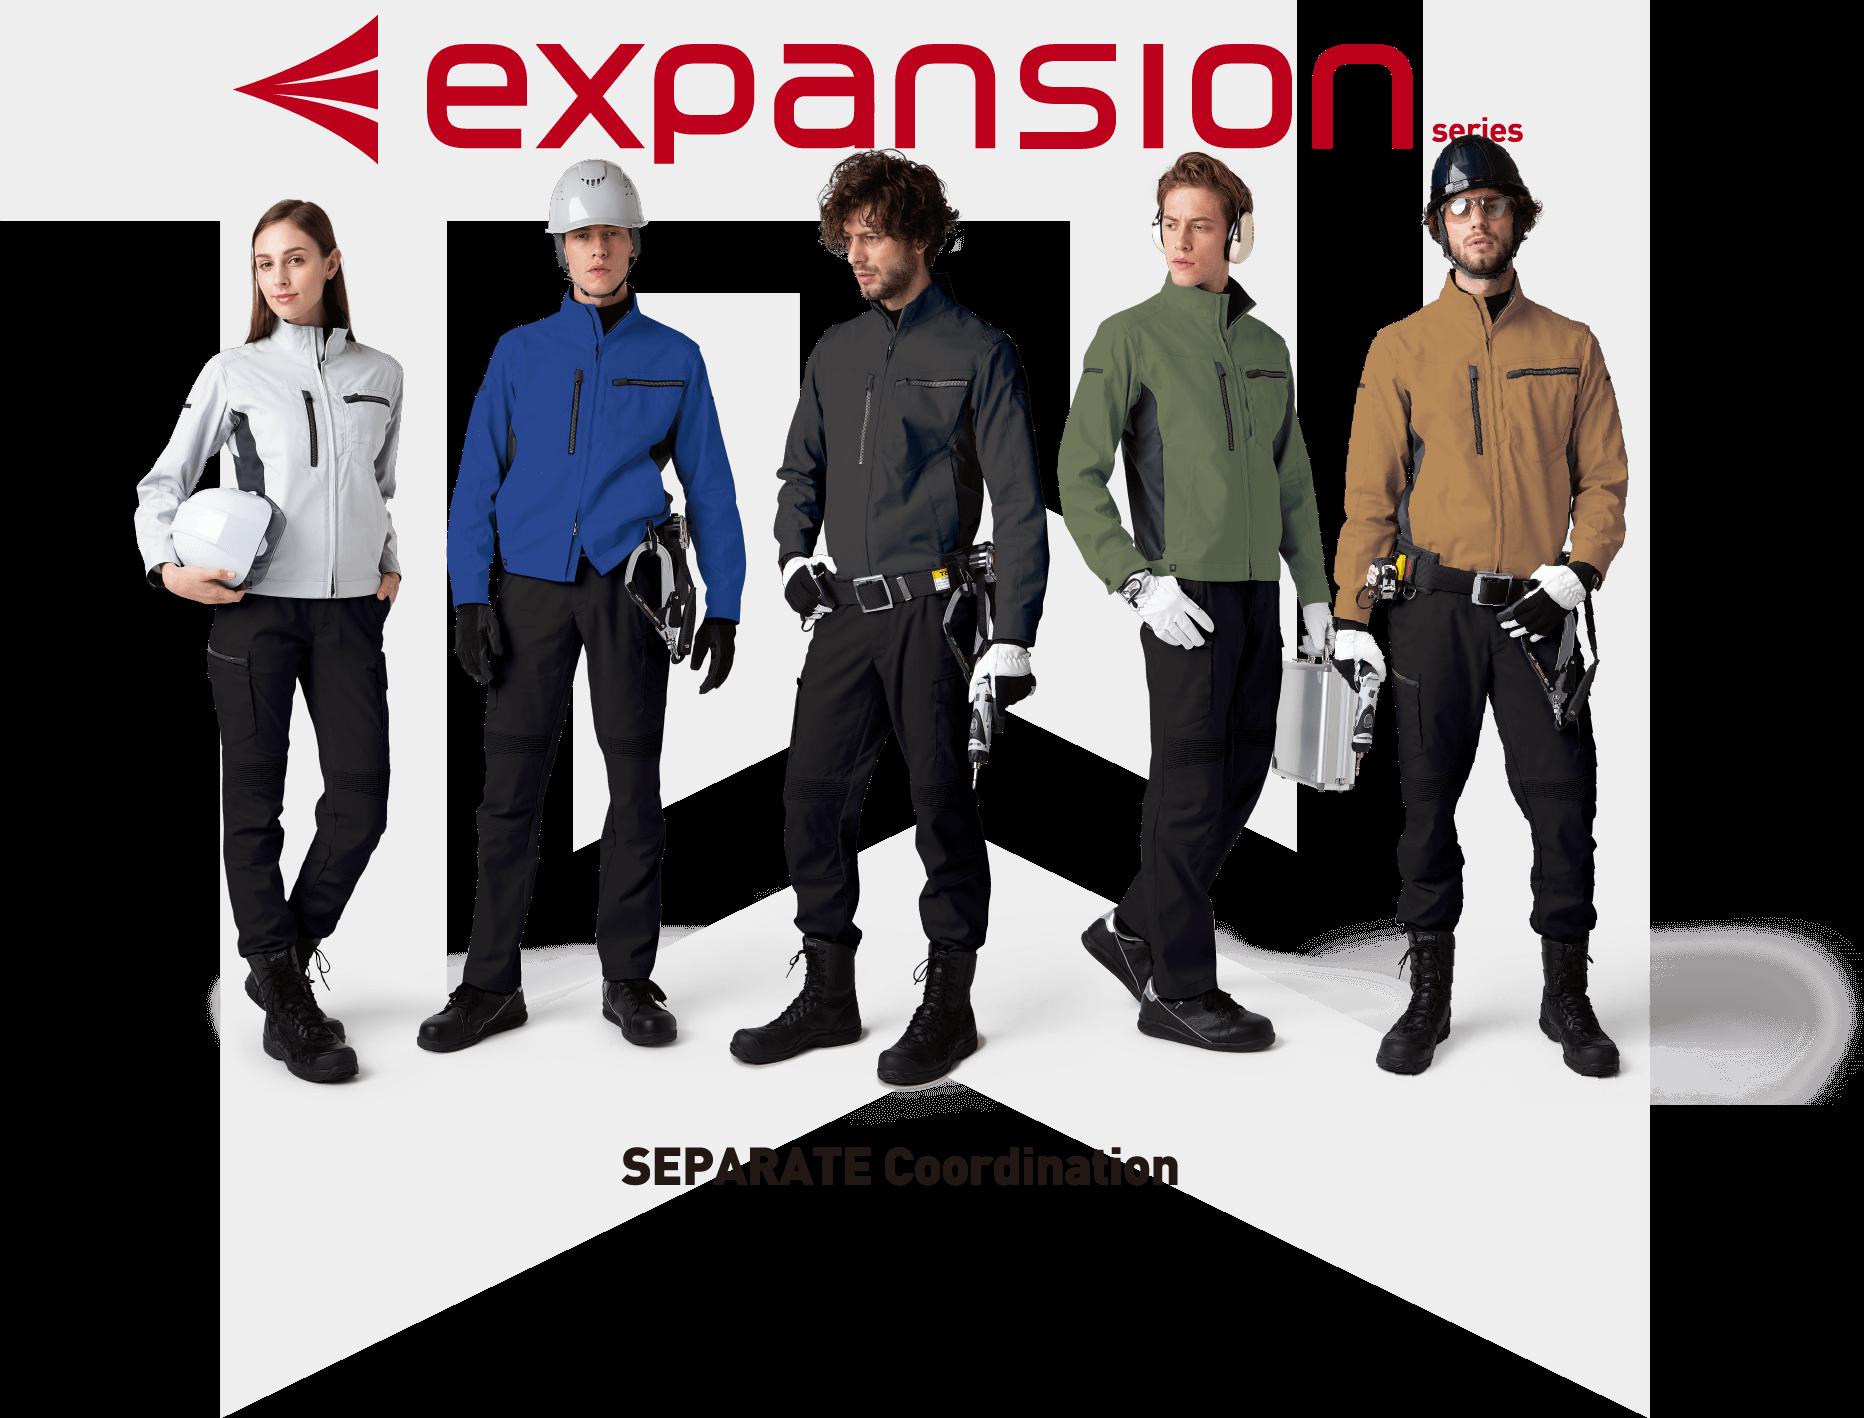 expansion series